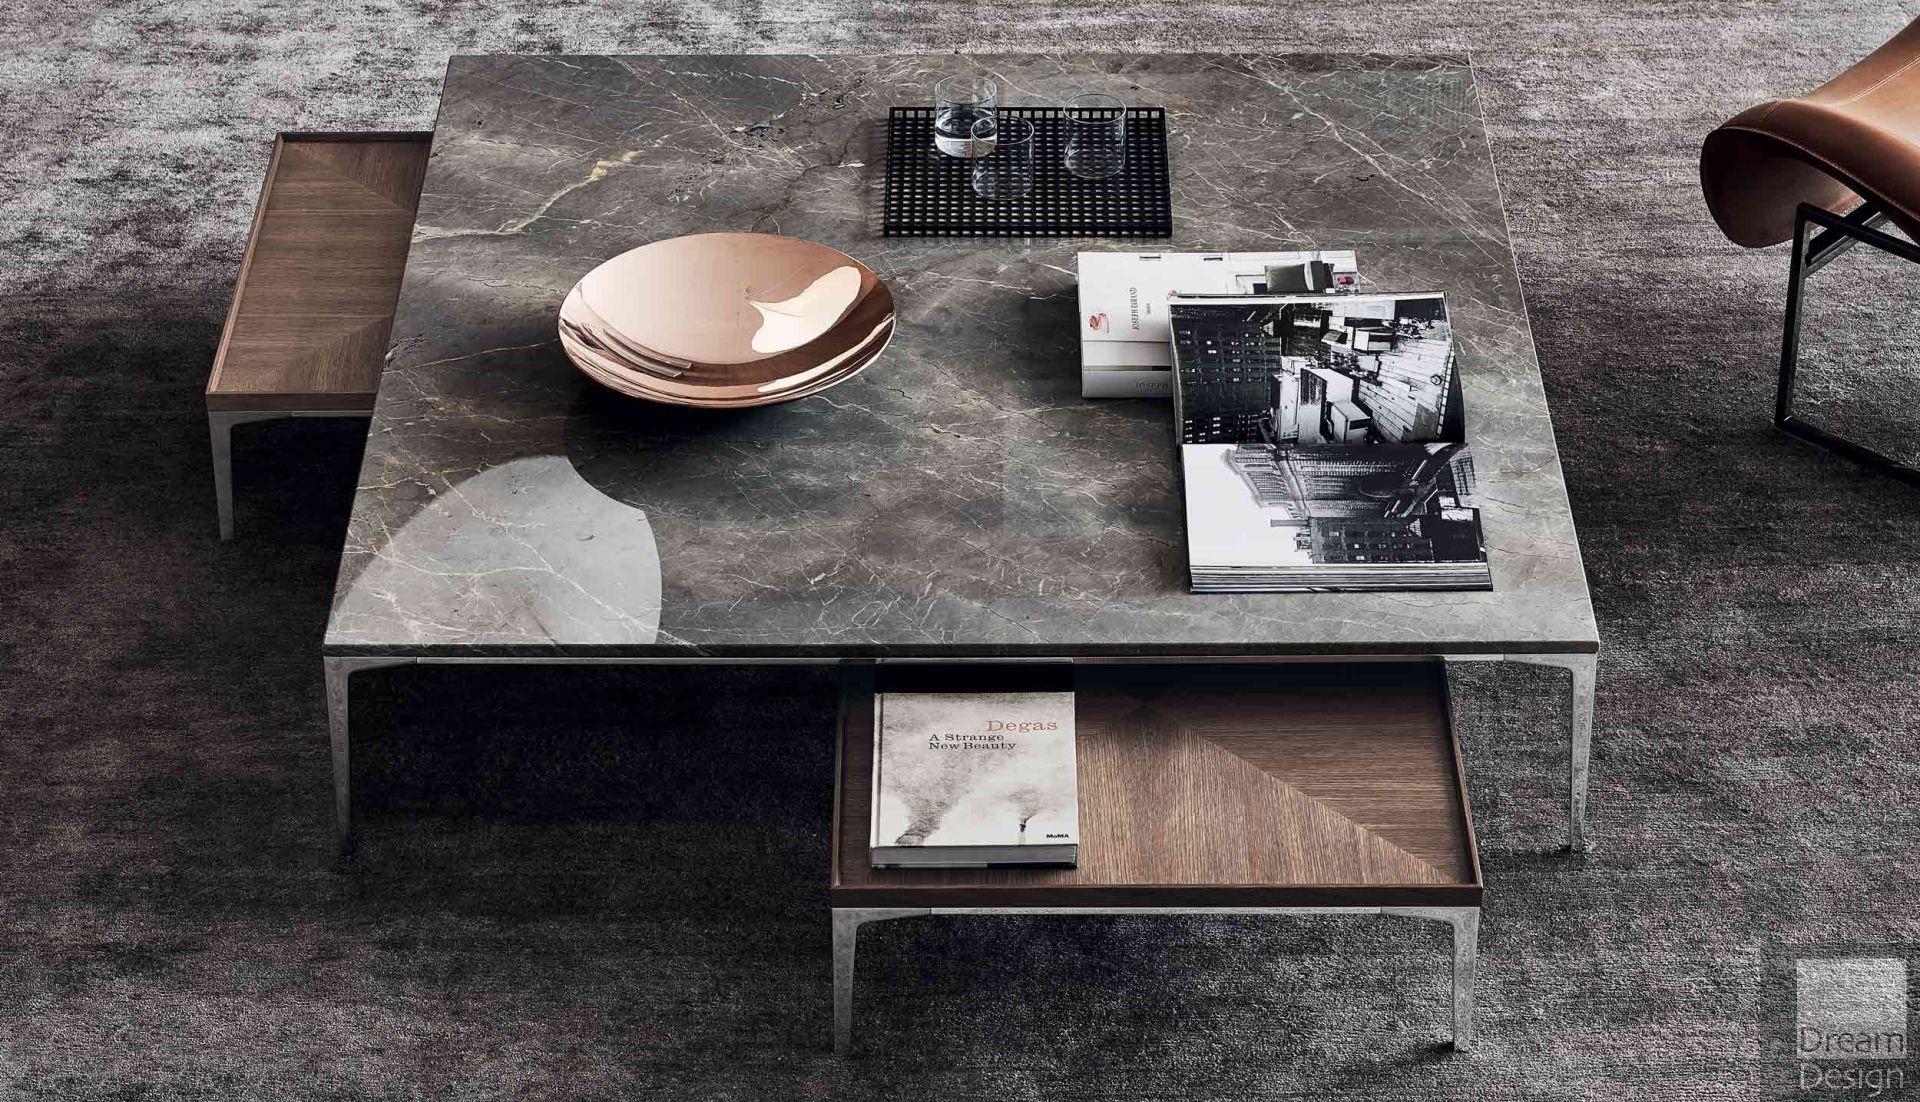 Rimadesio Tray Coffee Table By Giuseppe Bavuso Everything But Ordinary Coffee Table Coffee Table Design Modern Coffee Table Design [ 1102 x 1920 Pixel ]